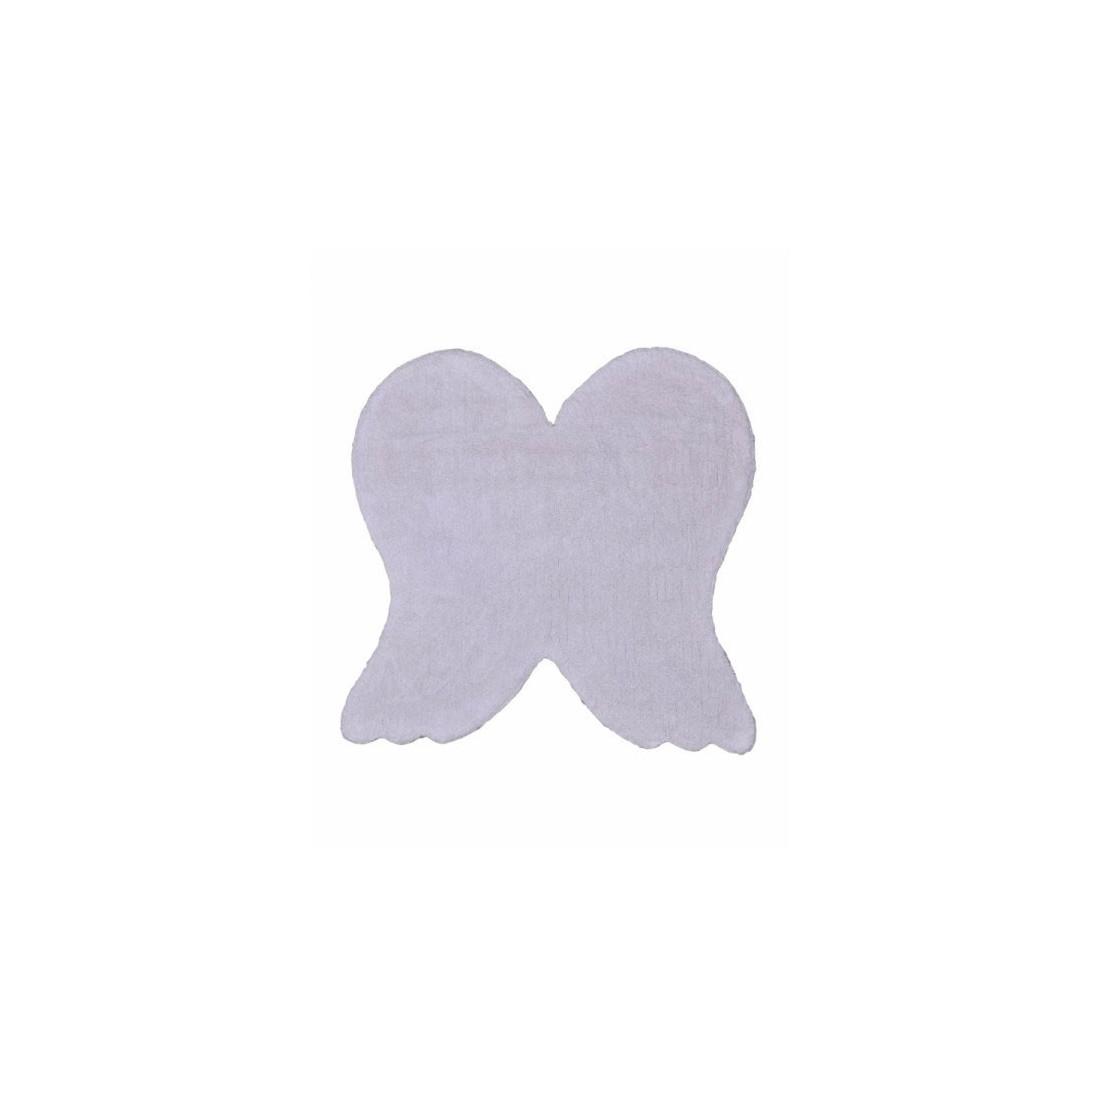 tapis enfant lavable ailes d 39 ange blanc lorena canals ma chambramoi. Black Bedroom Furniture Sets. Home Design Ideas